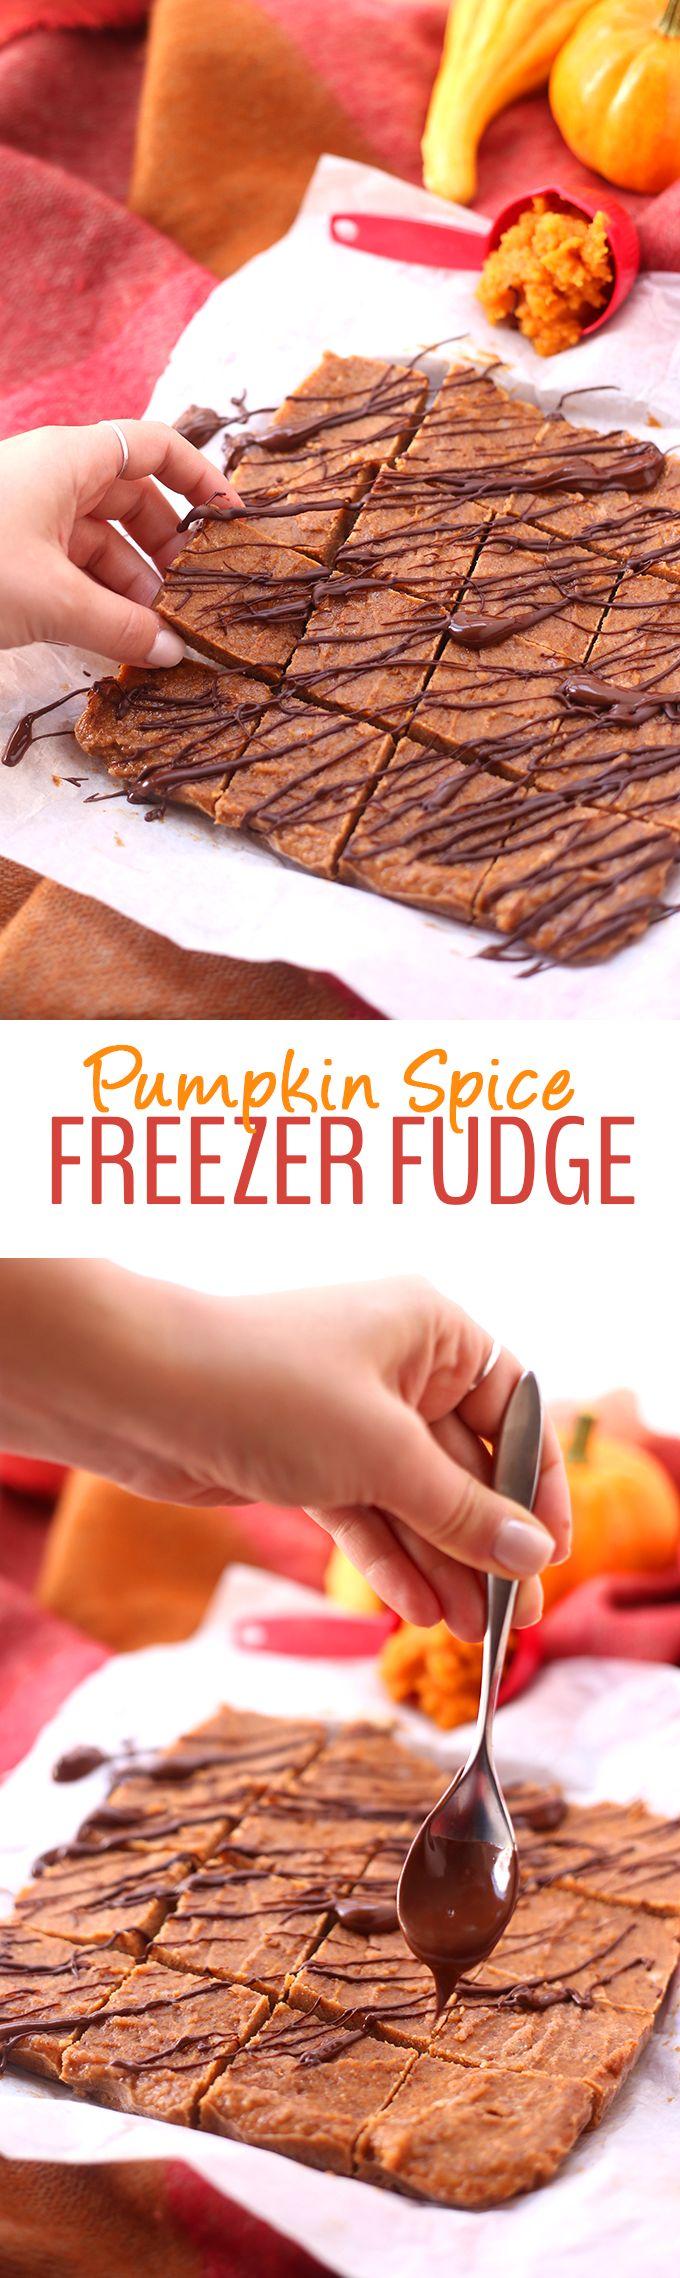 Pumpkin Spice Freezer Fudge by @TheHealthyMaven - The Healthy Maven